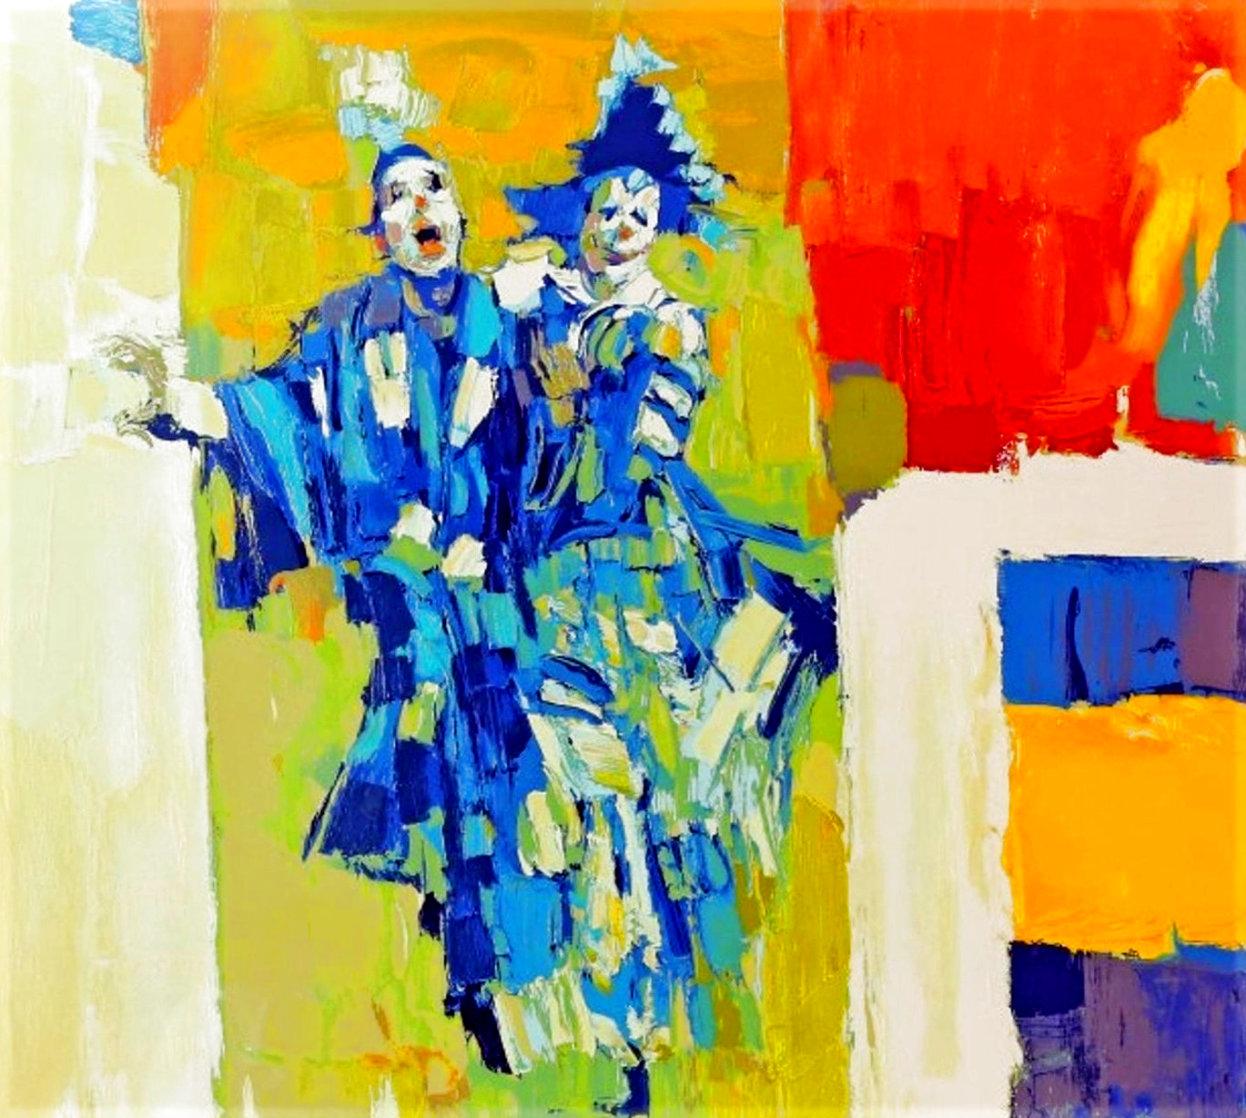 Deux Clowns 1979 Limited Edition Print by Nicola Simbari